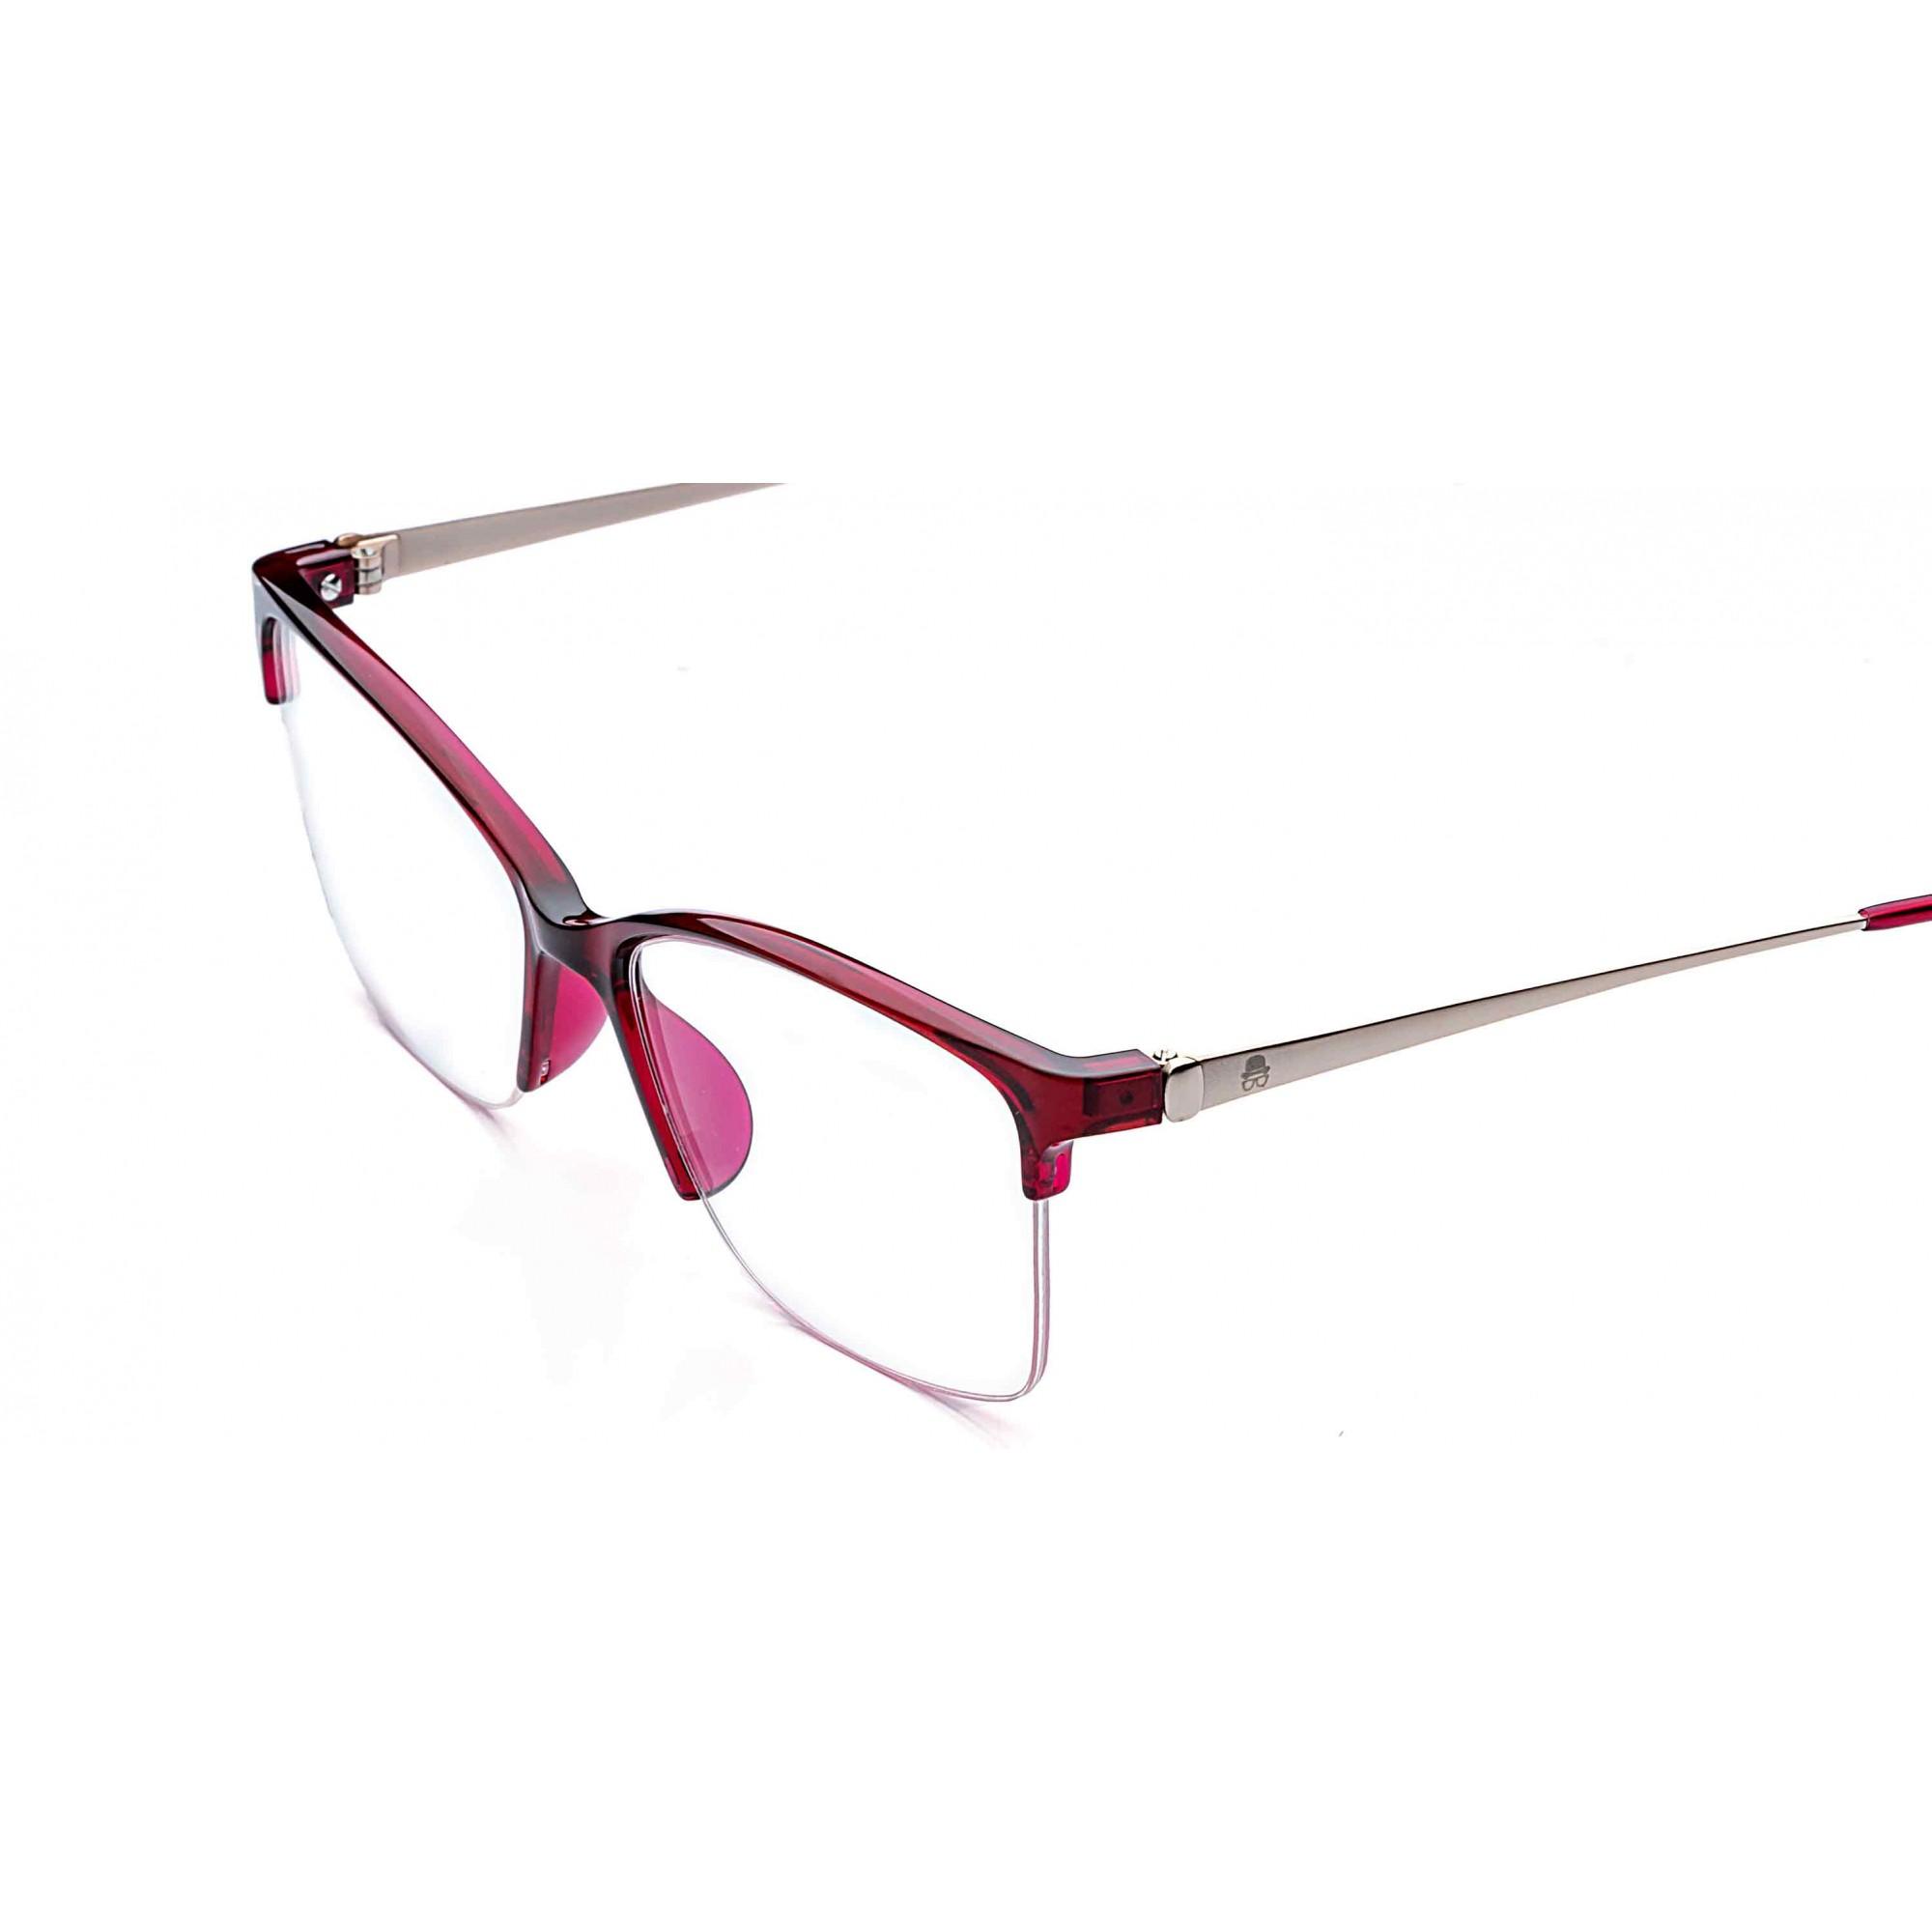 Soft - Rafael Lopes Eyewear